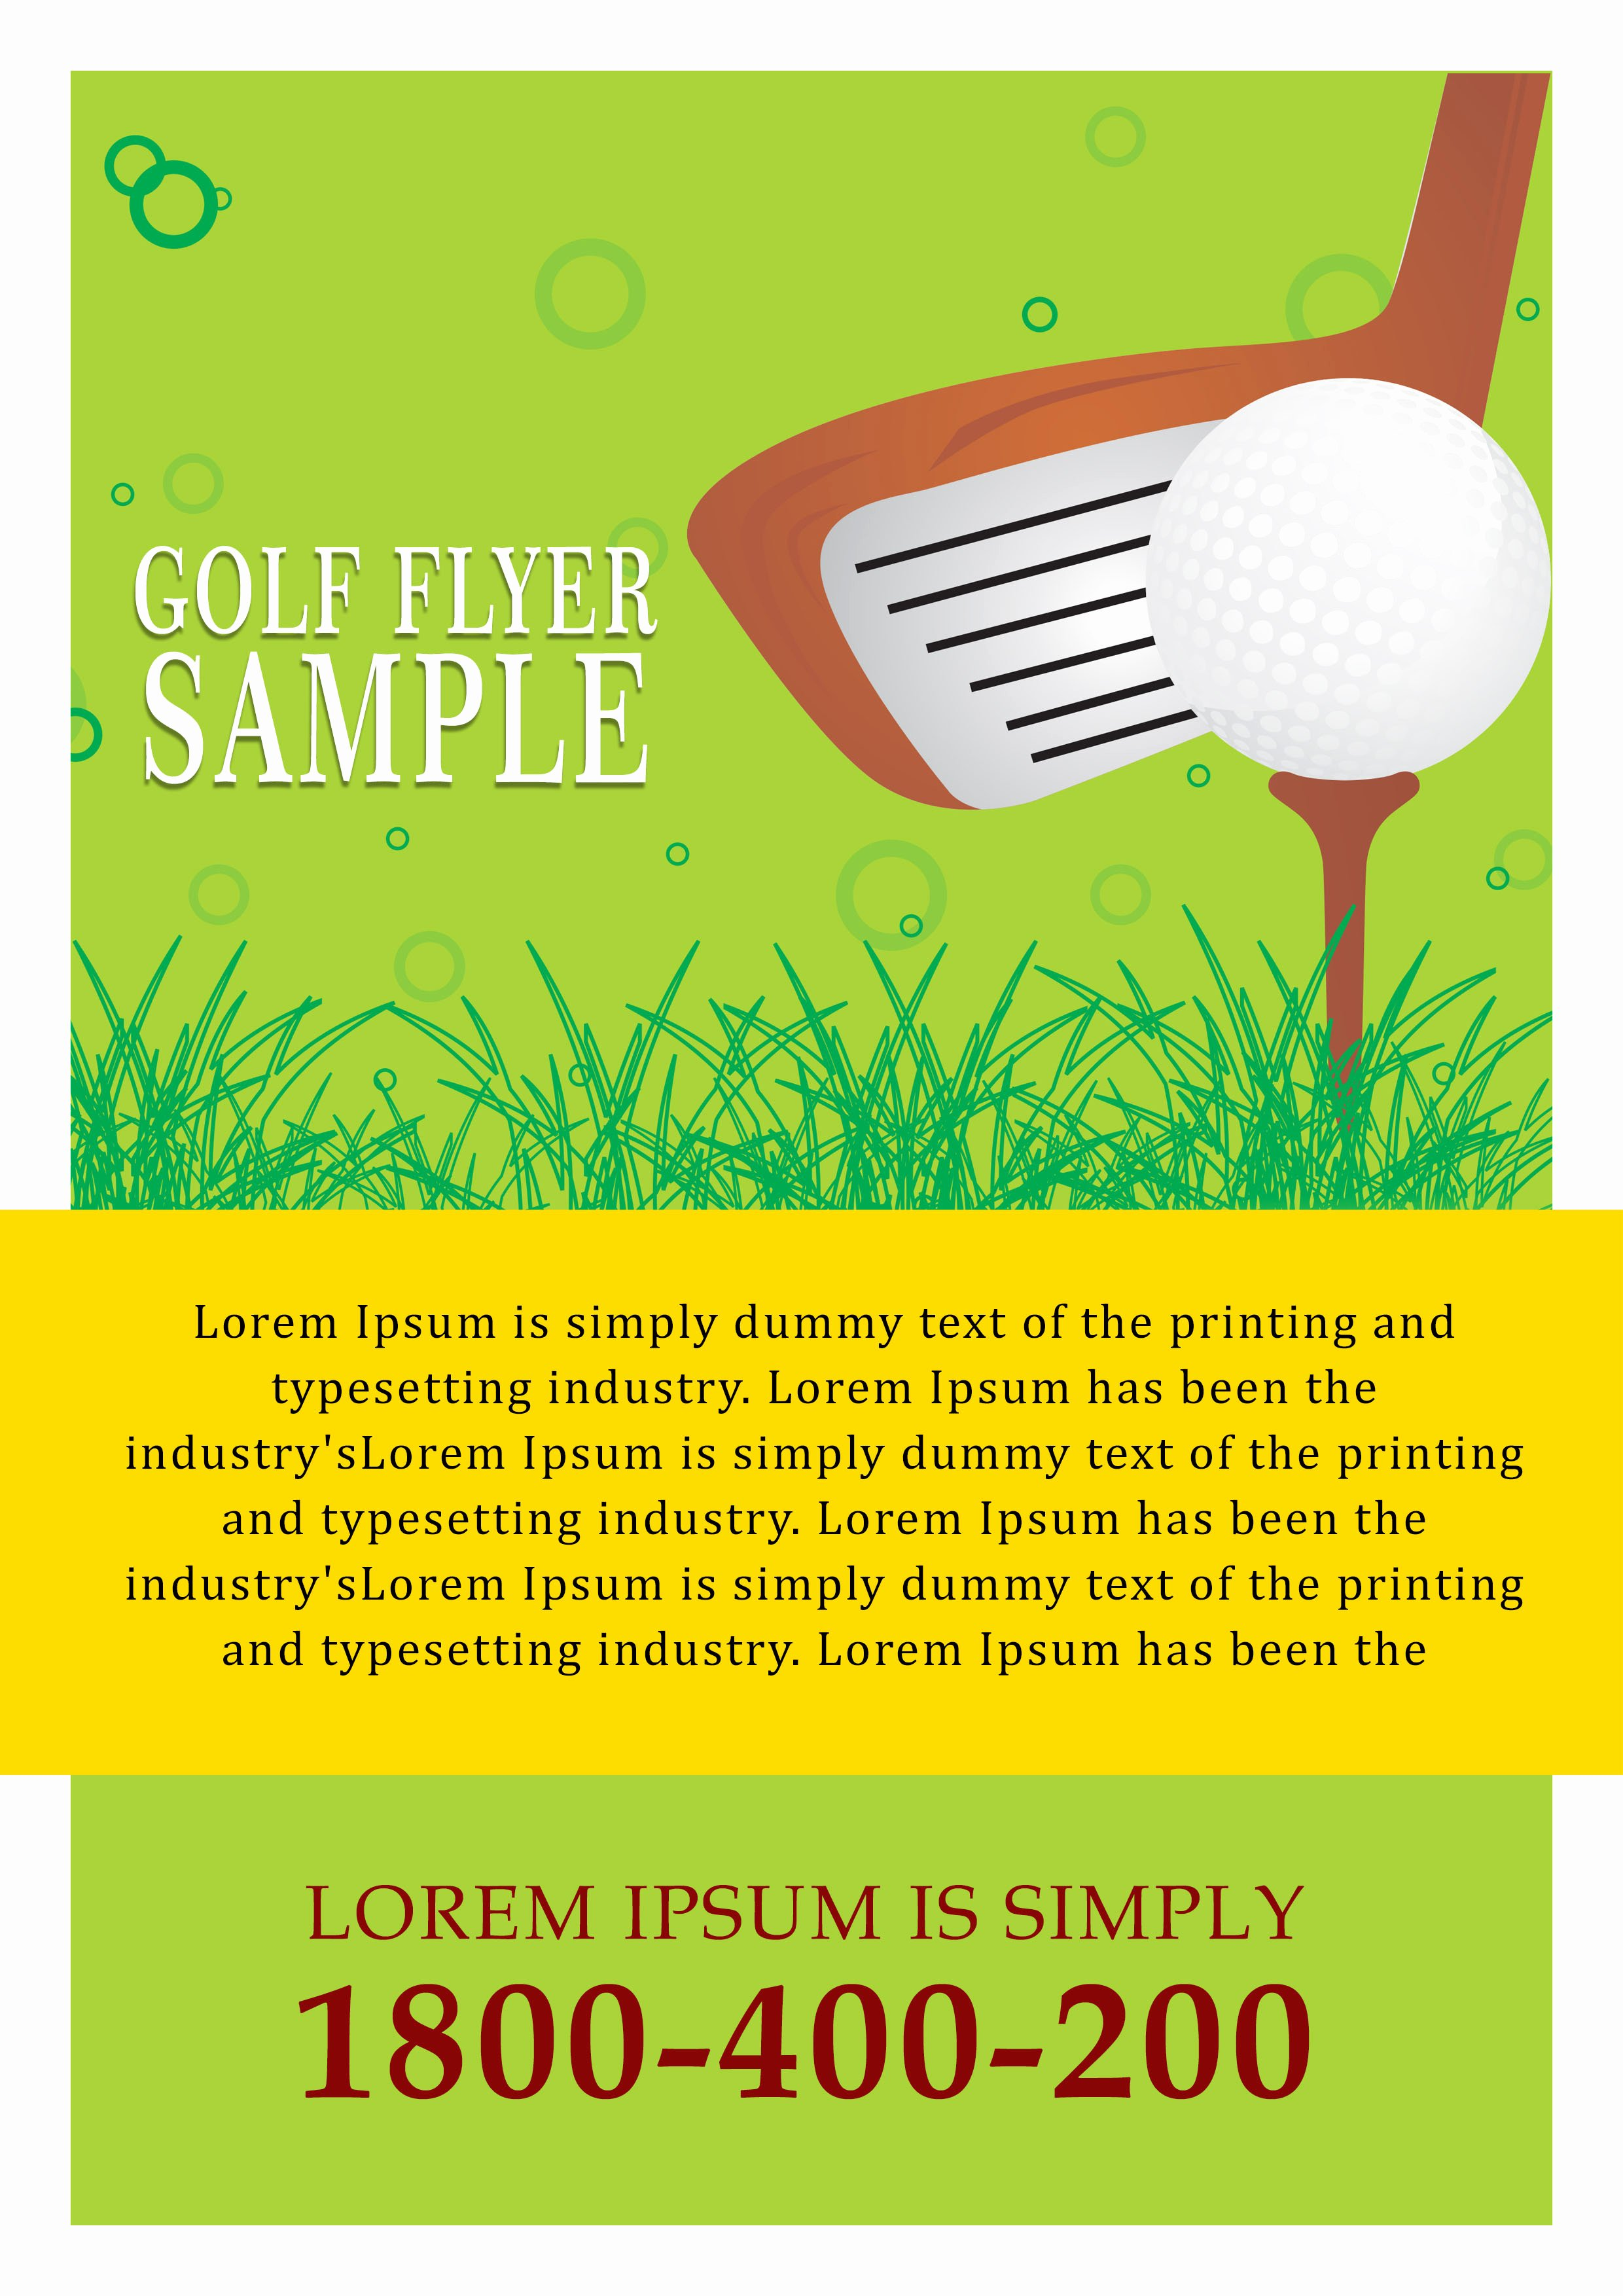 Golf tournament Flyers Template Elegant 15 Free Golf tournament Flyer Templates Fundraiser